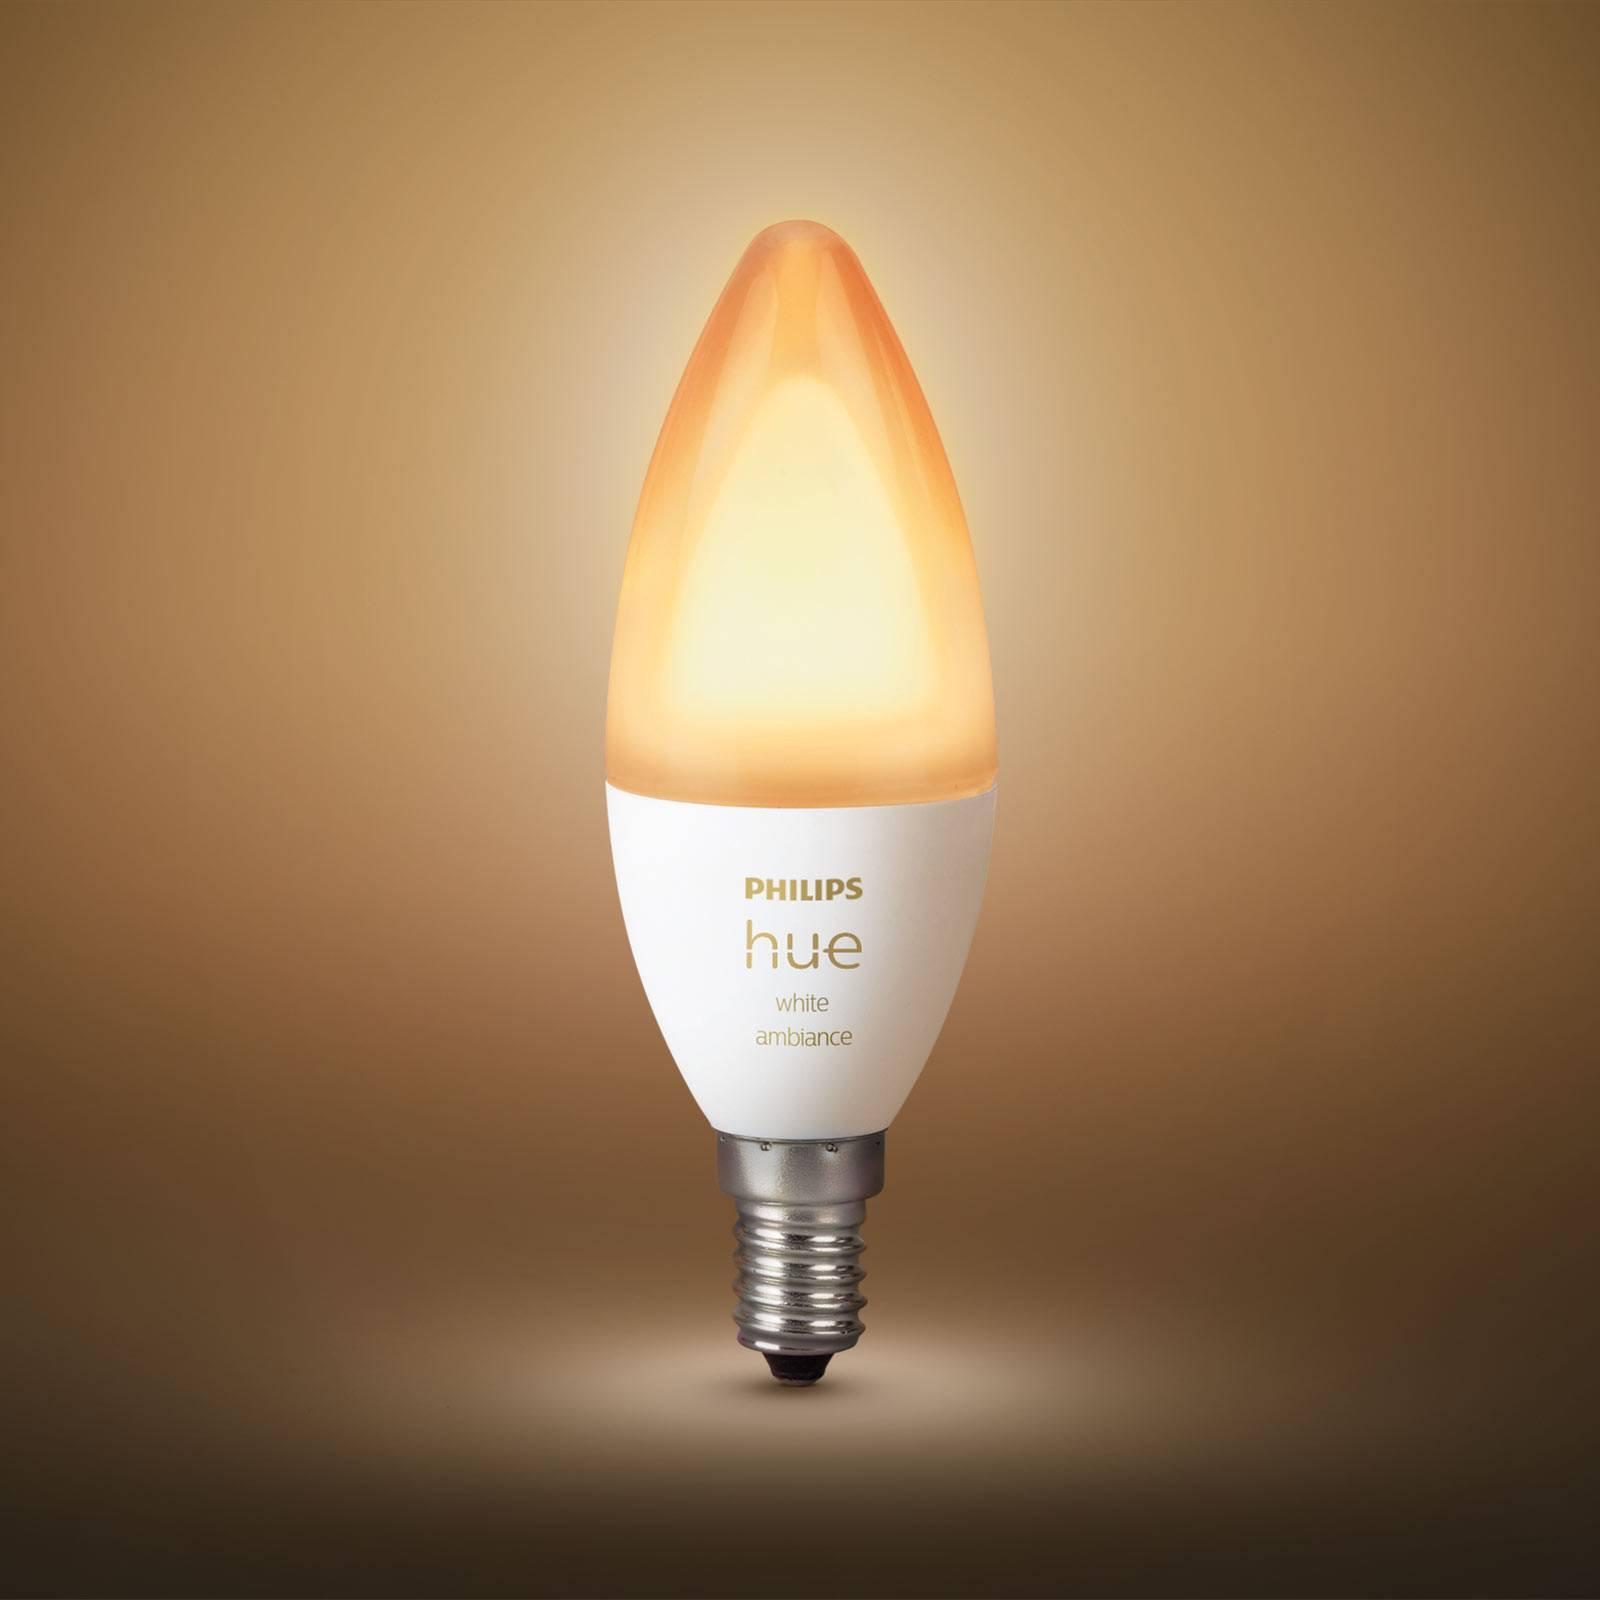 Philips Hue mignonpære White Ambiance E14 5,2W